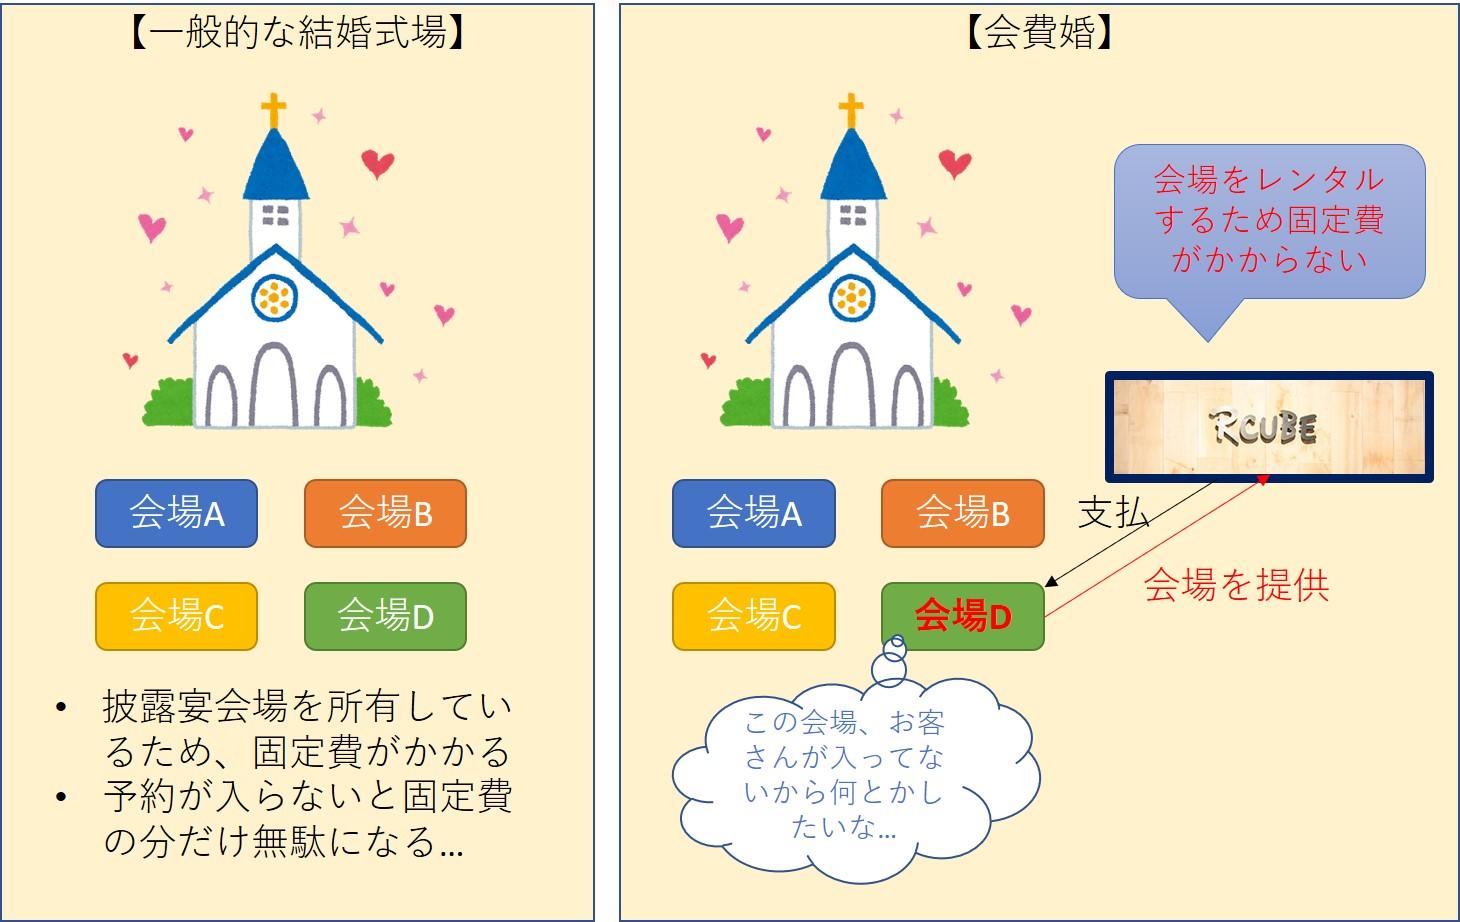 .jpg - 会費婚:自己負担5万円の理由とデメリット、評判